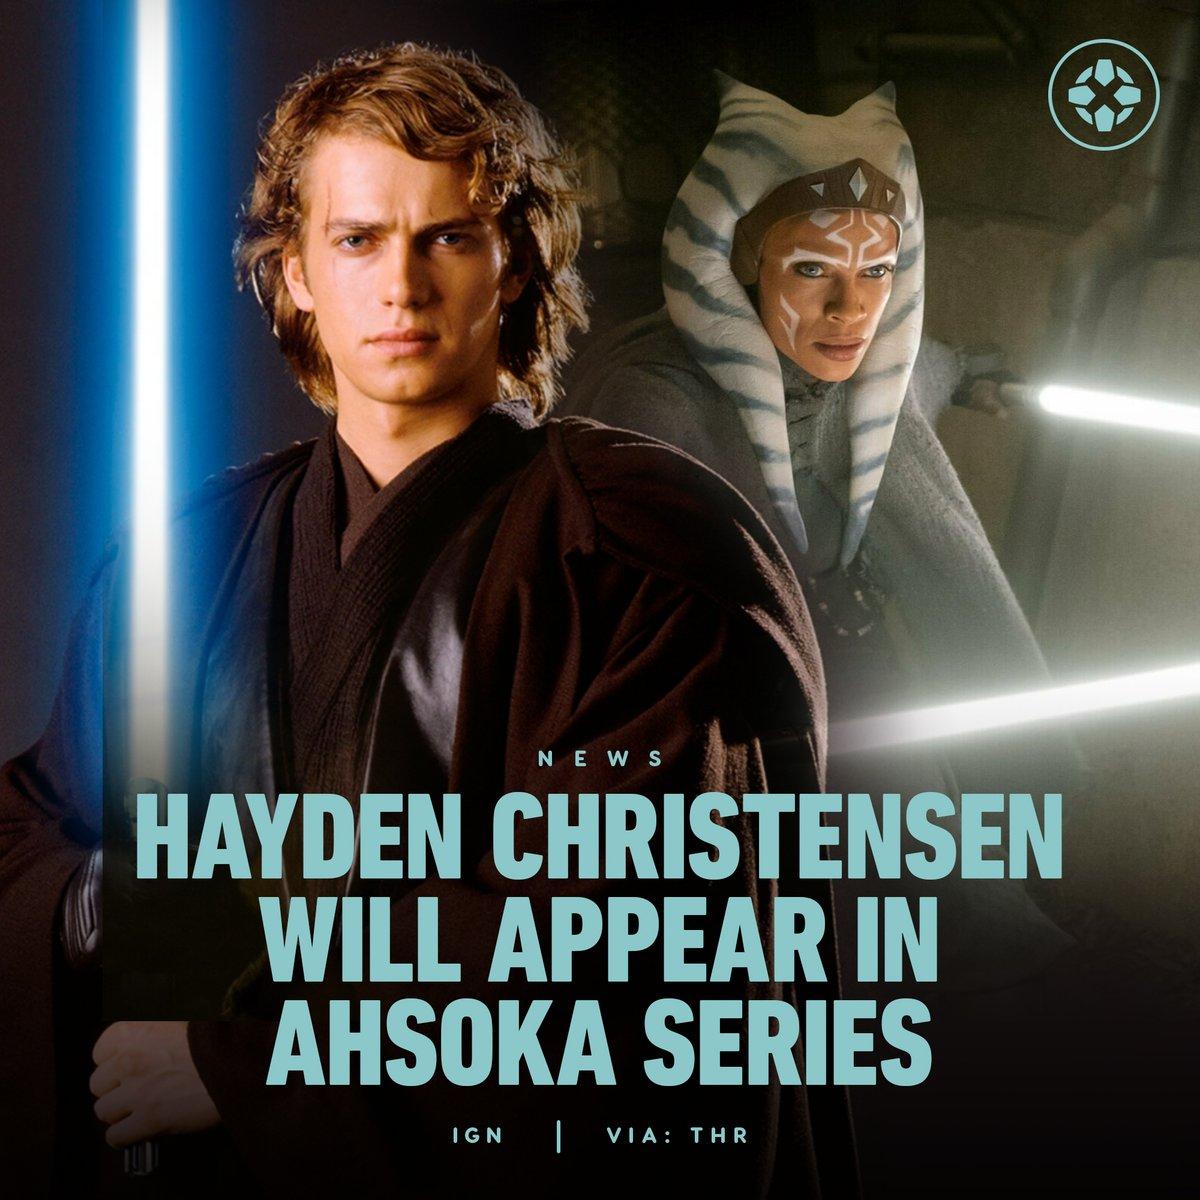 @IGN's photo on Hayden